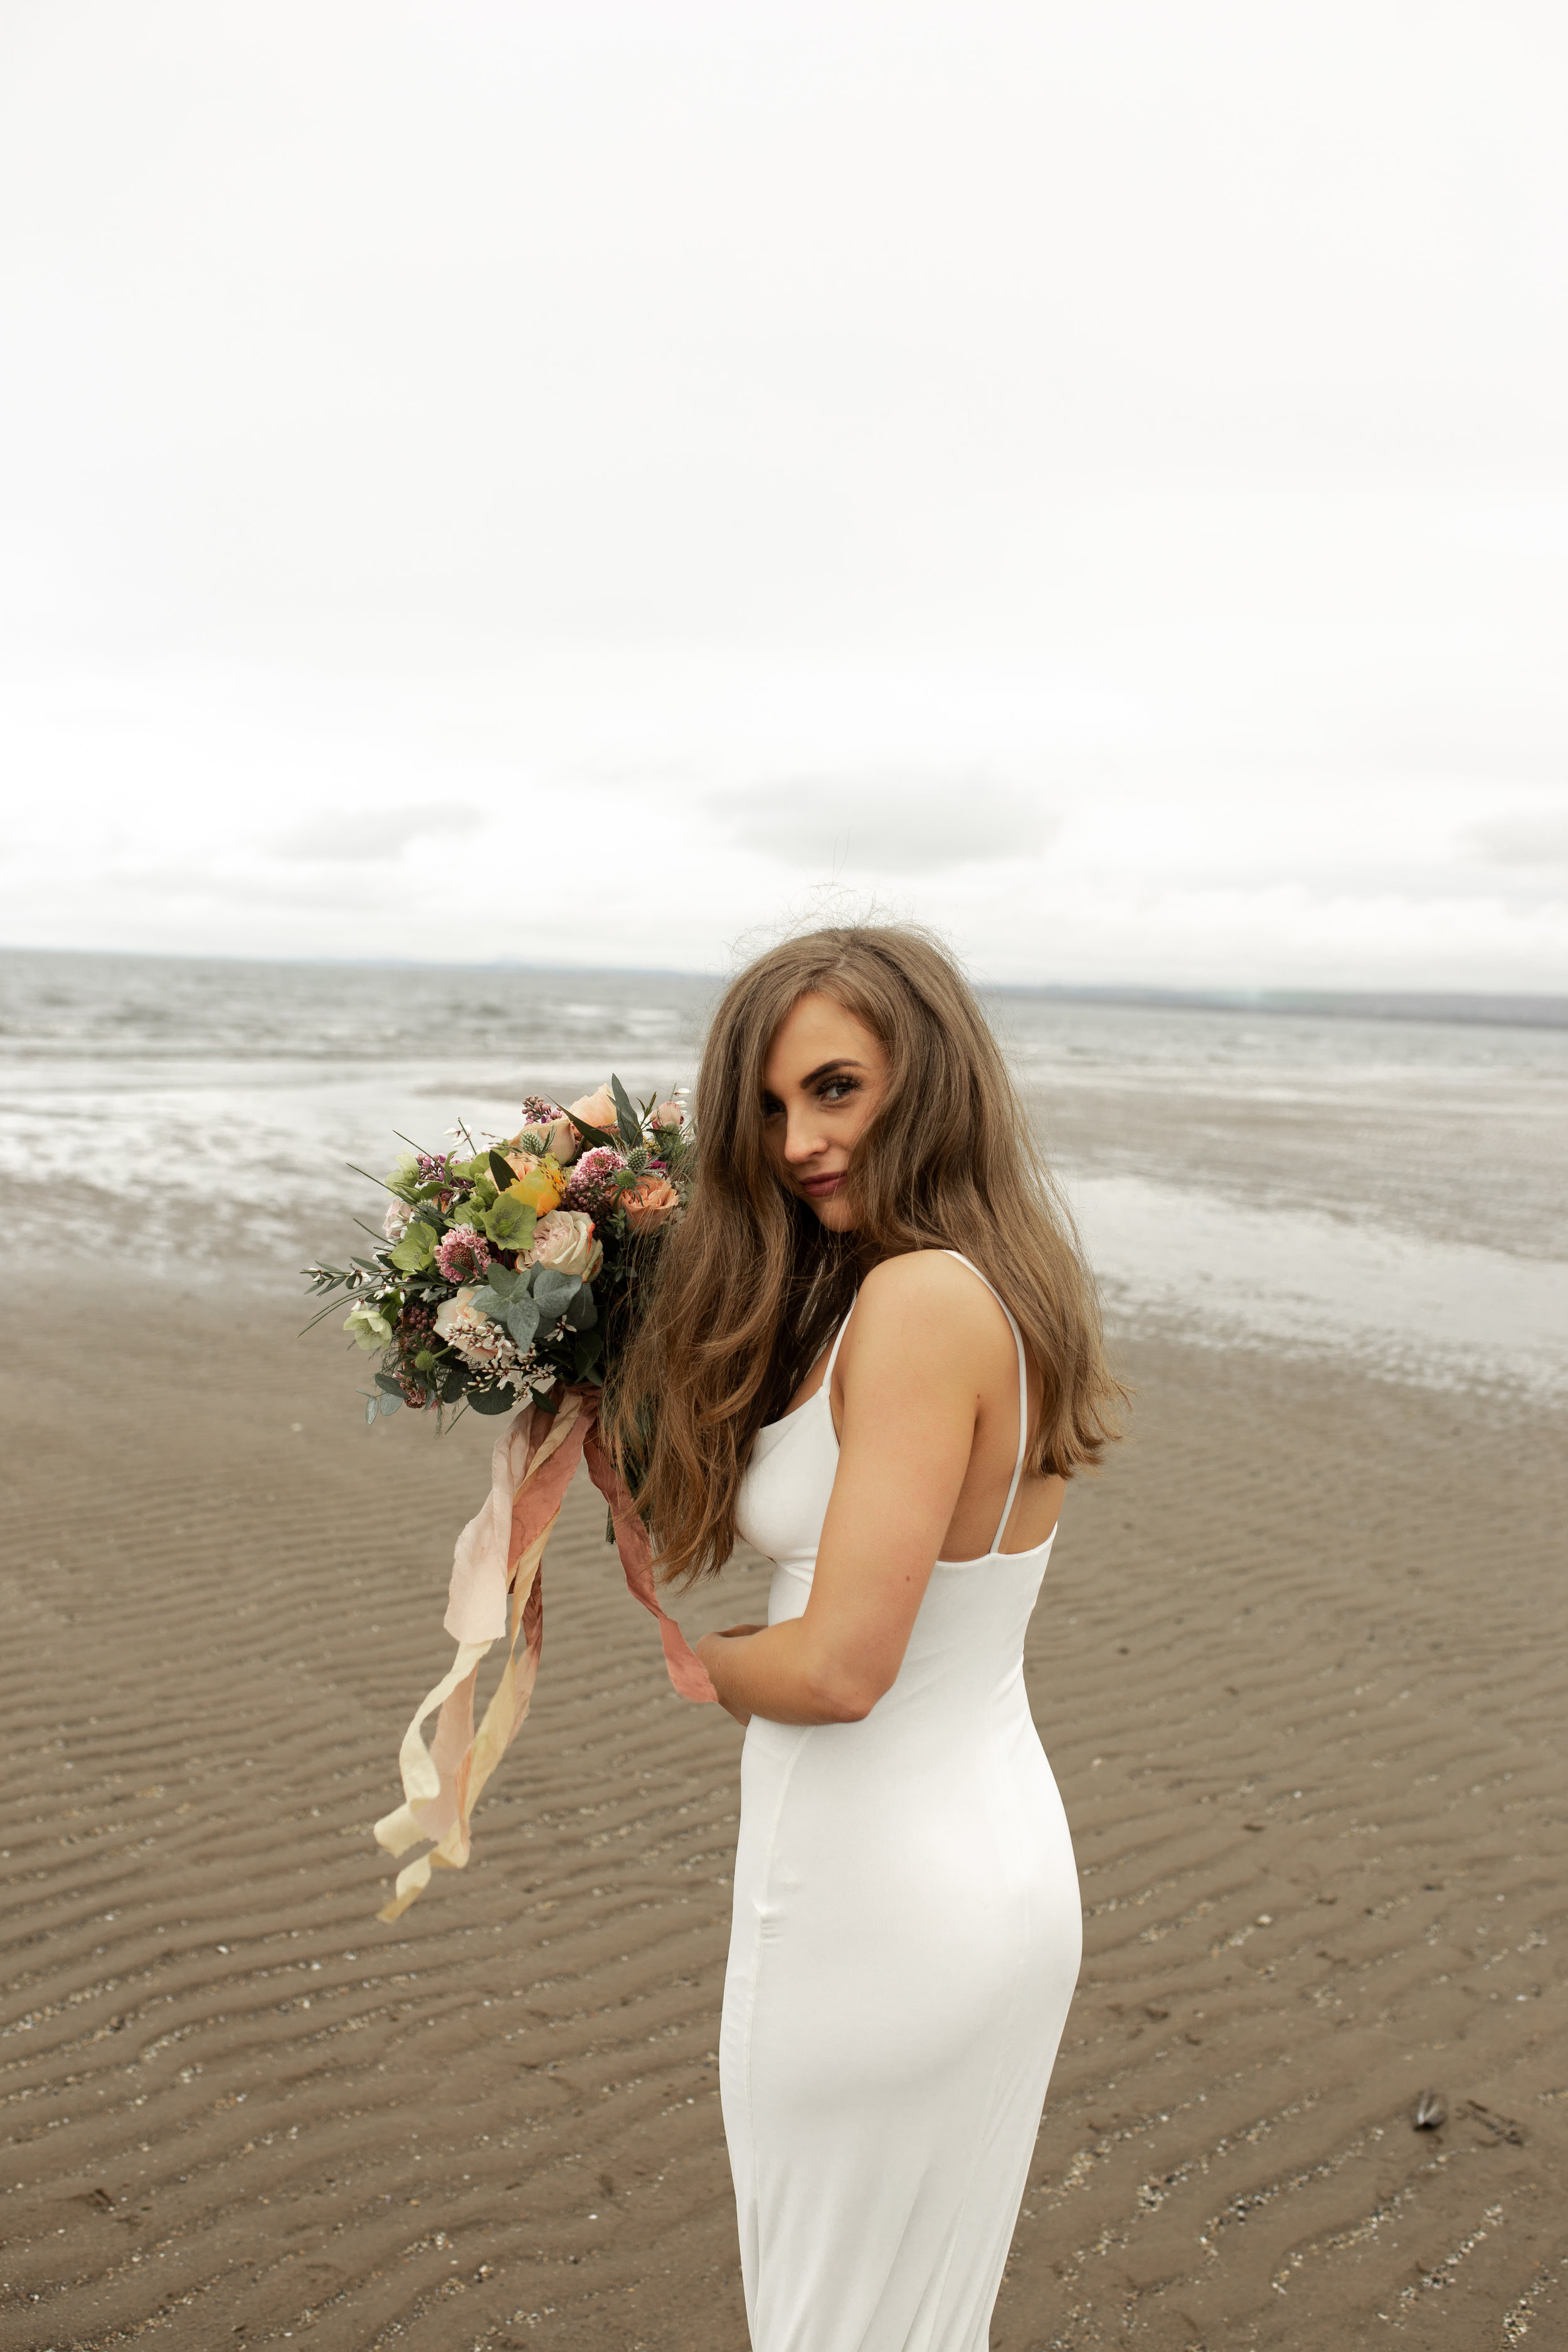 Paula_Russell_Photography_Edinburgh_Wedding_BBonnie_Flowers_13